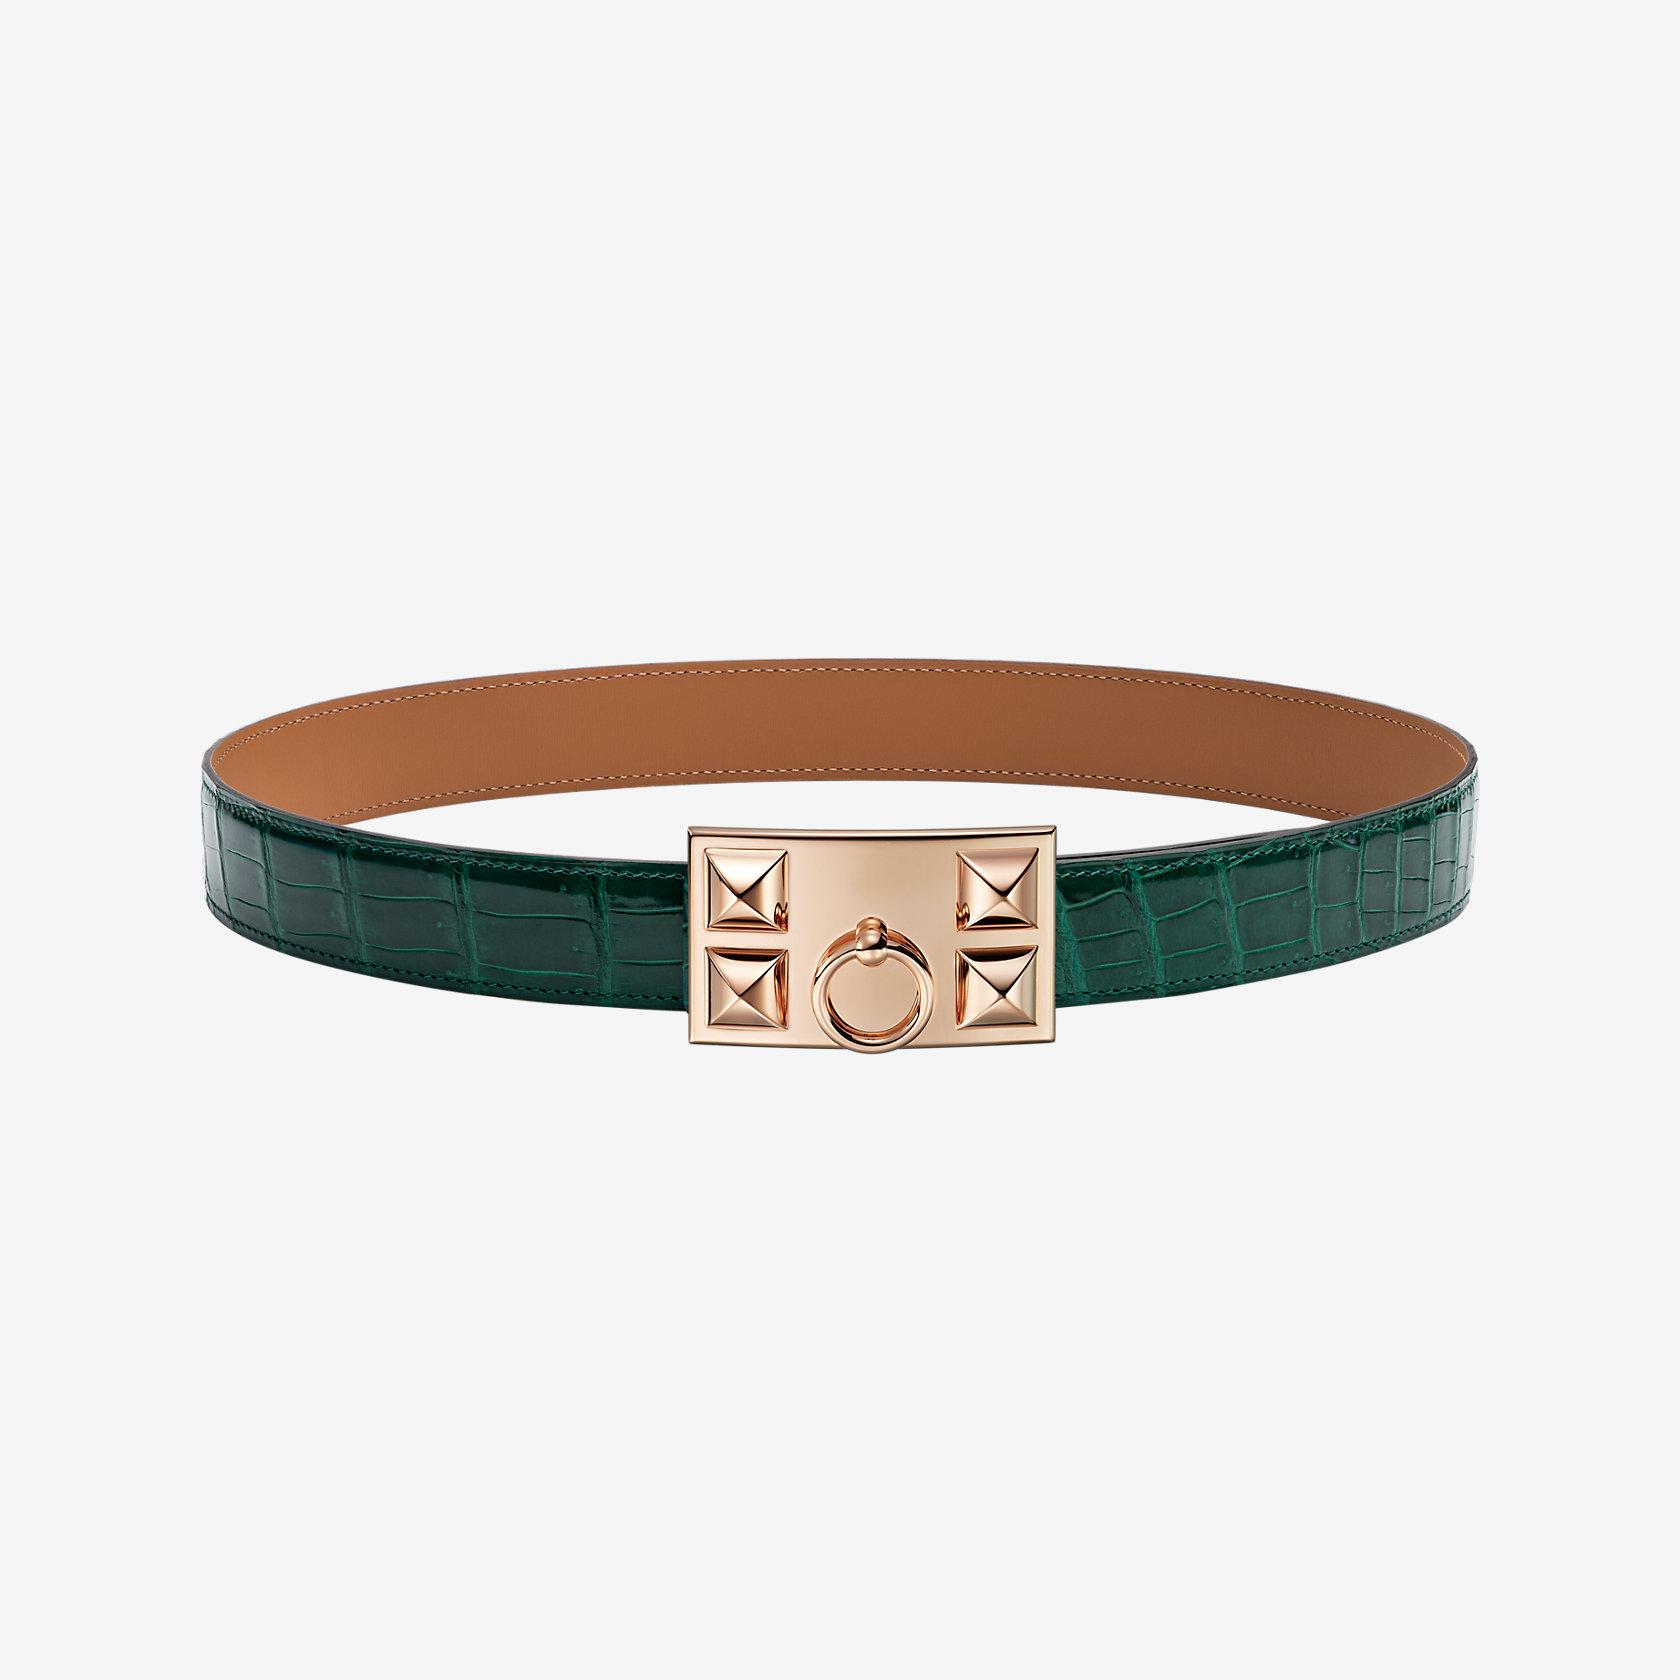 Buy How to hermes wear belt buckle picture trends